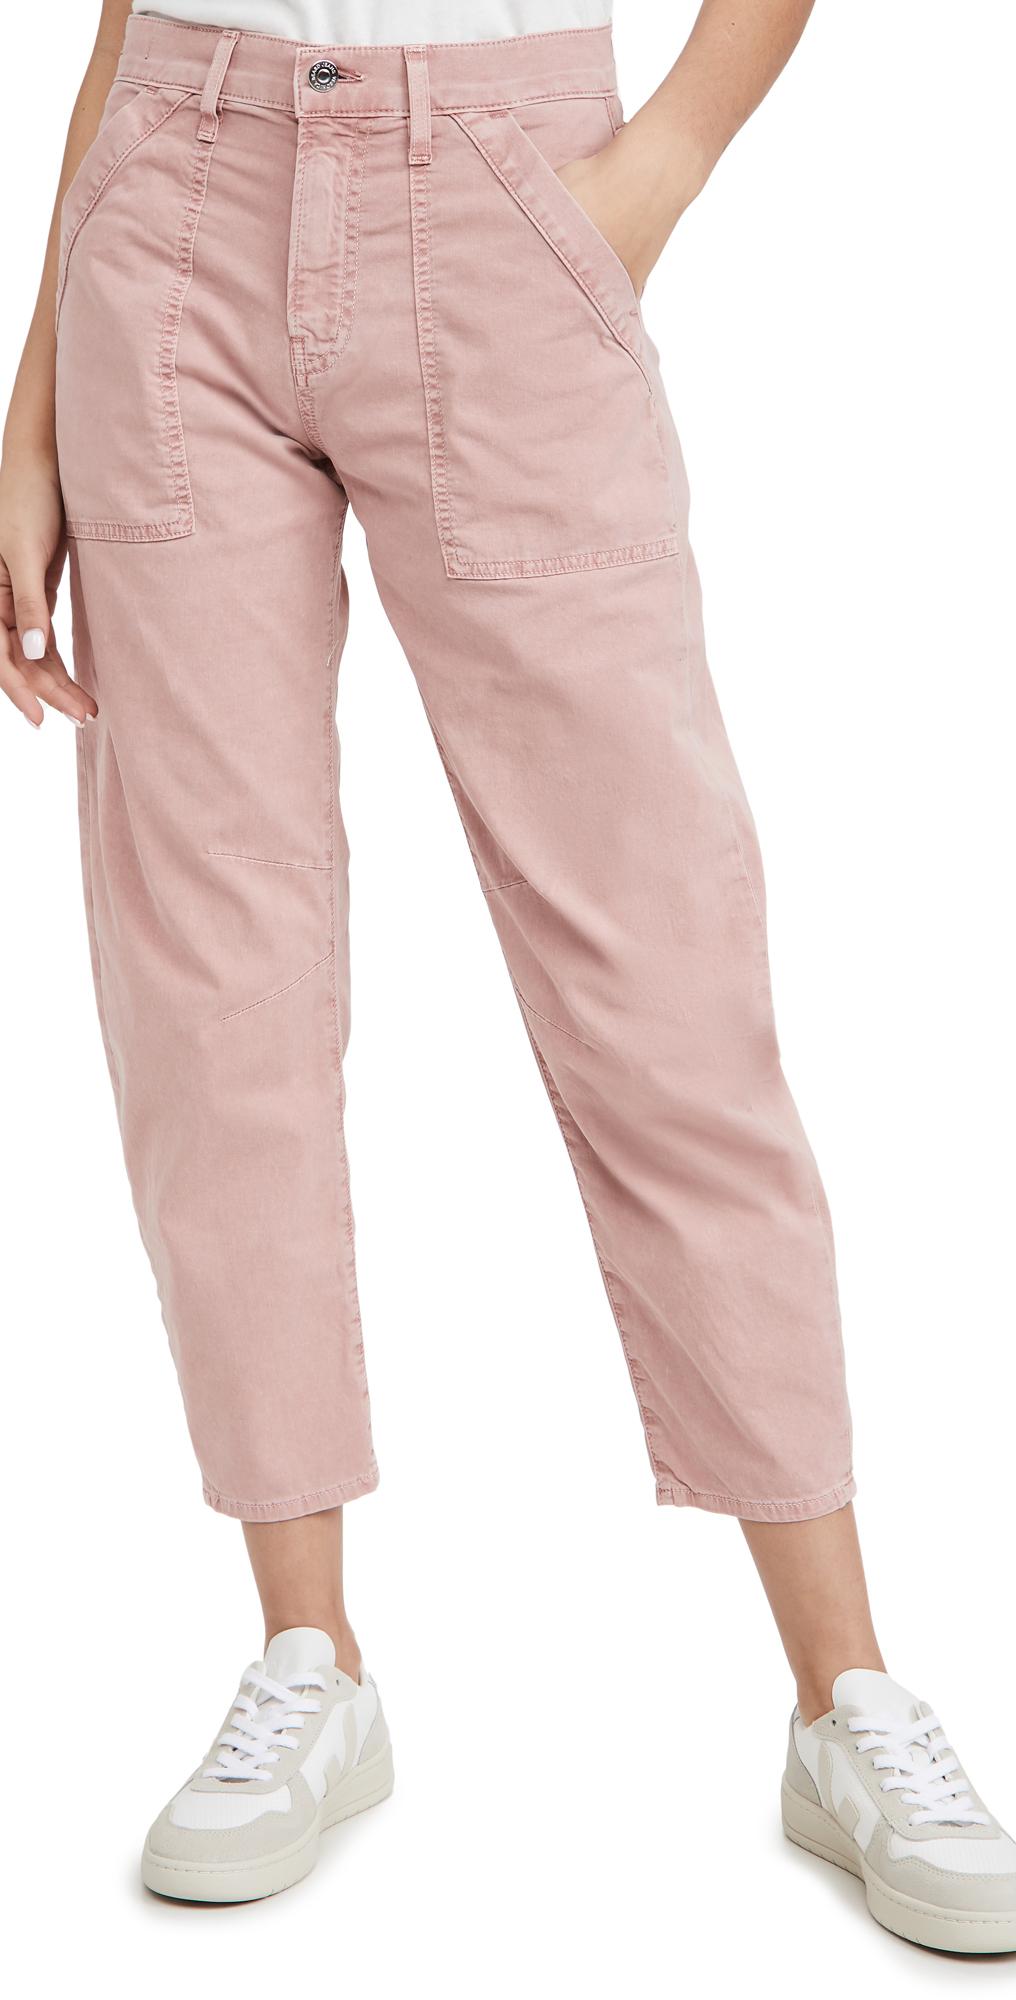 Veronica Beard Jean Charlie Barrel Pants with Patch Pockets